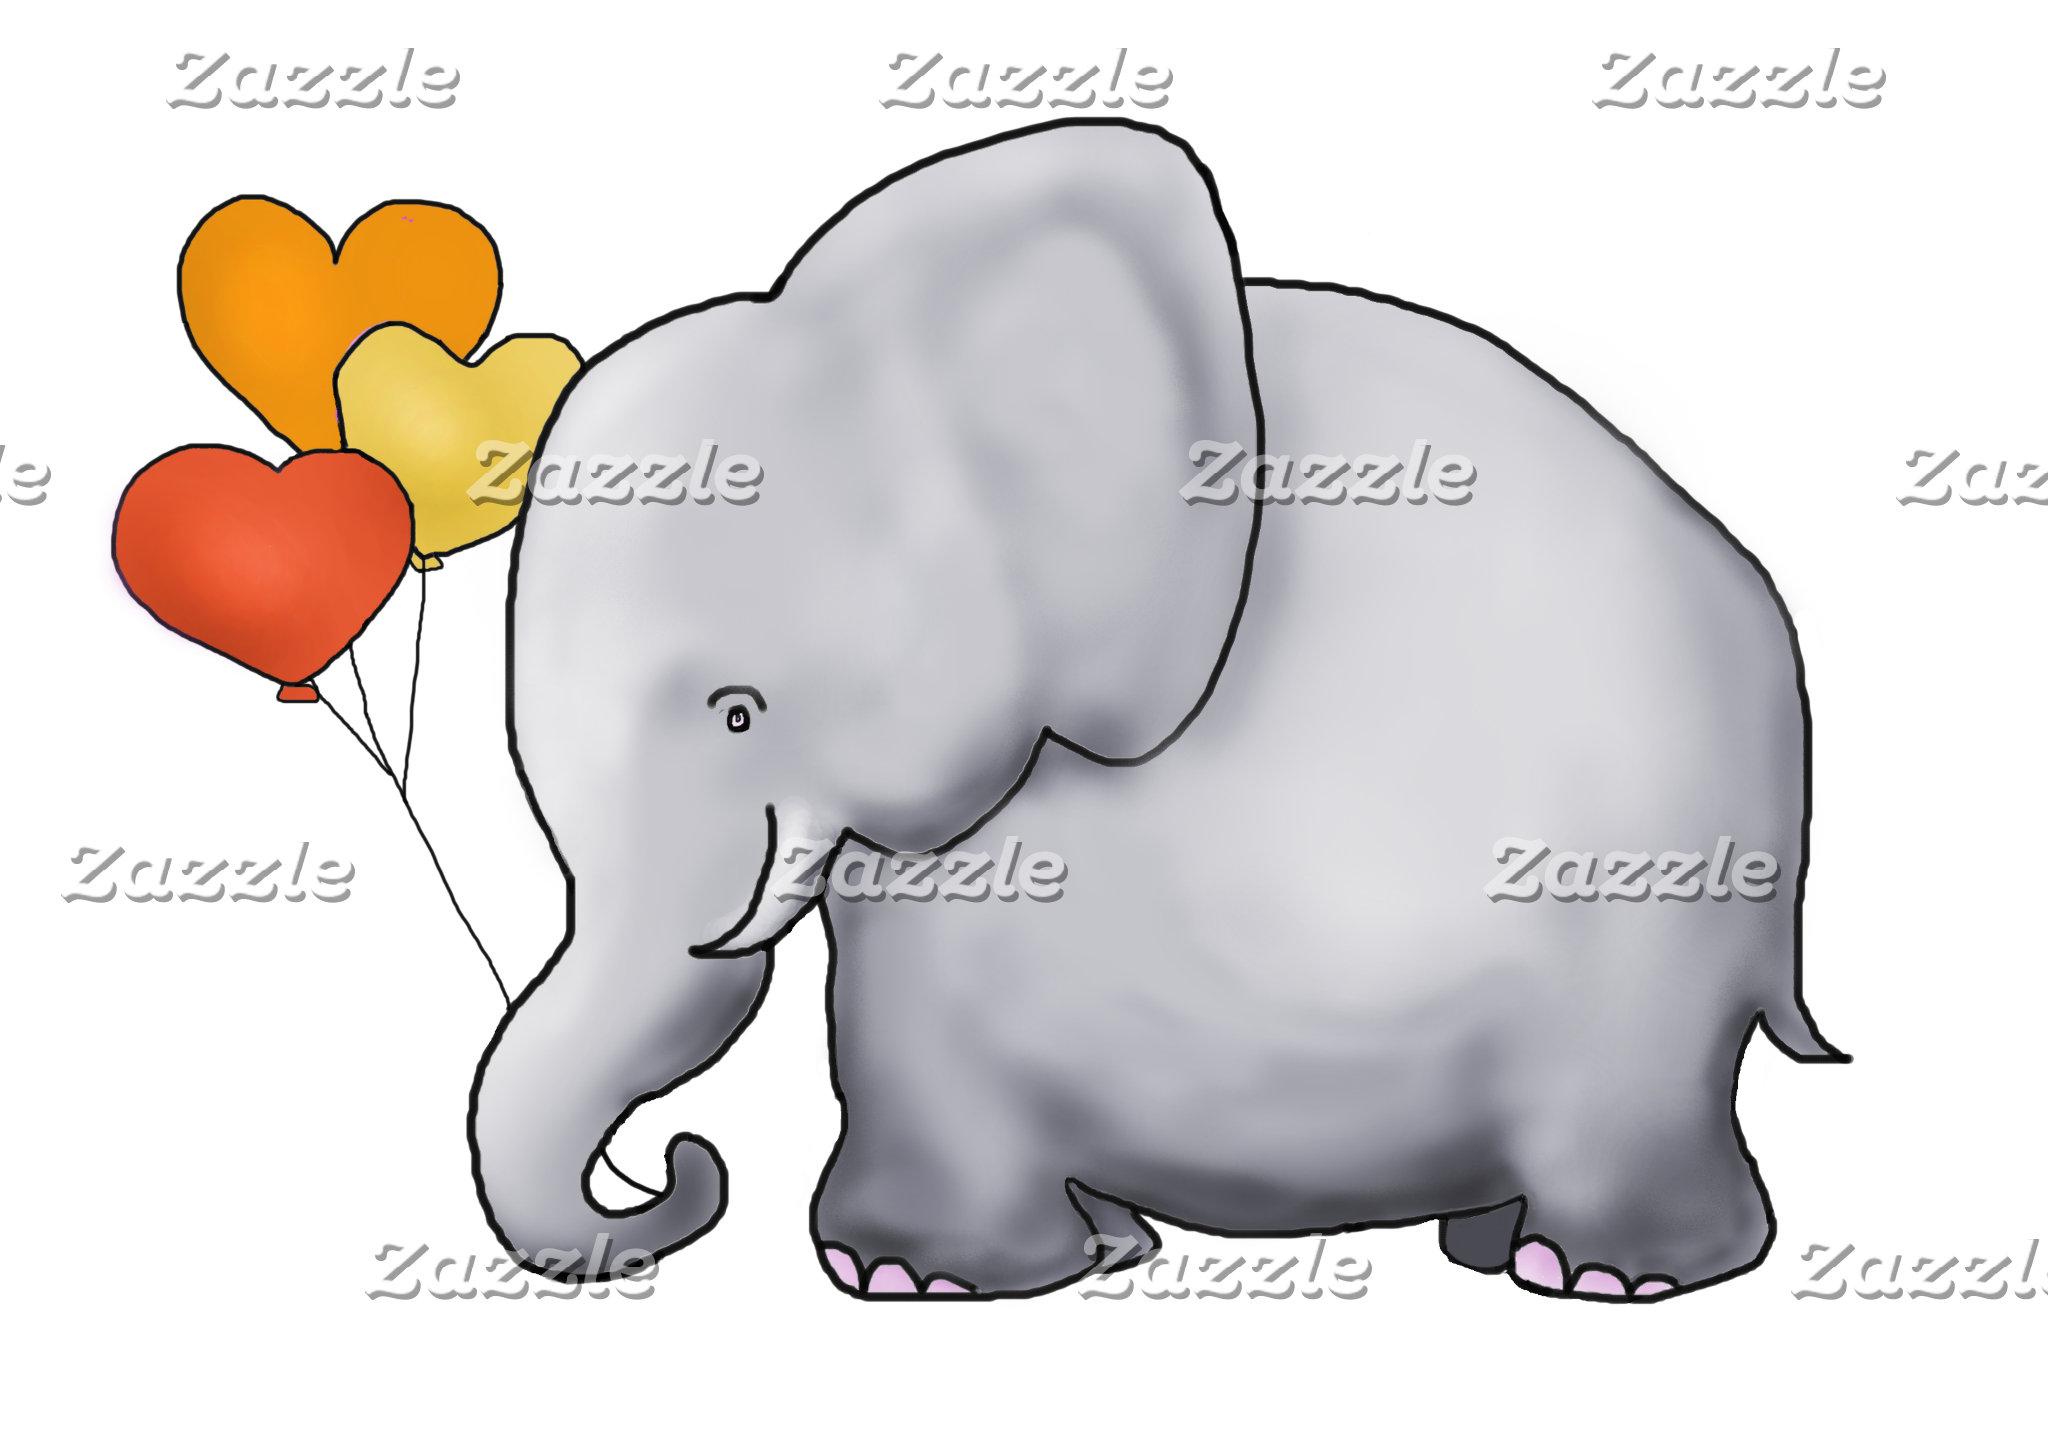 Heart Balloon Elephant - Yellow Baby Shower